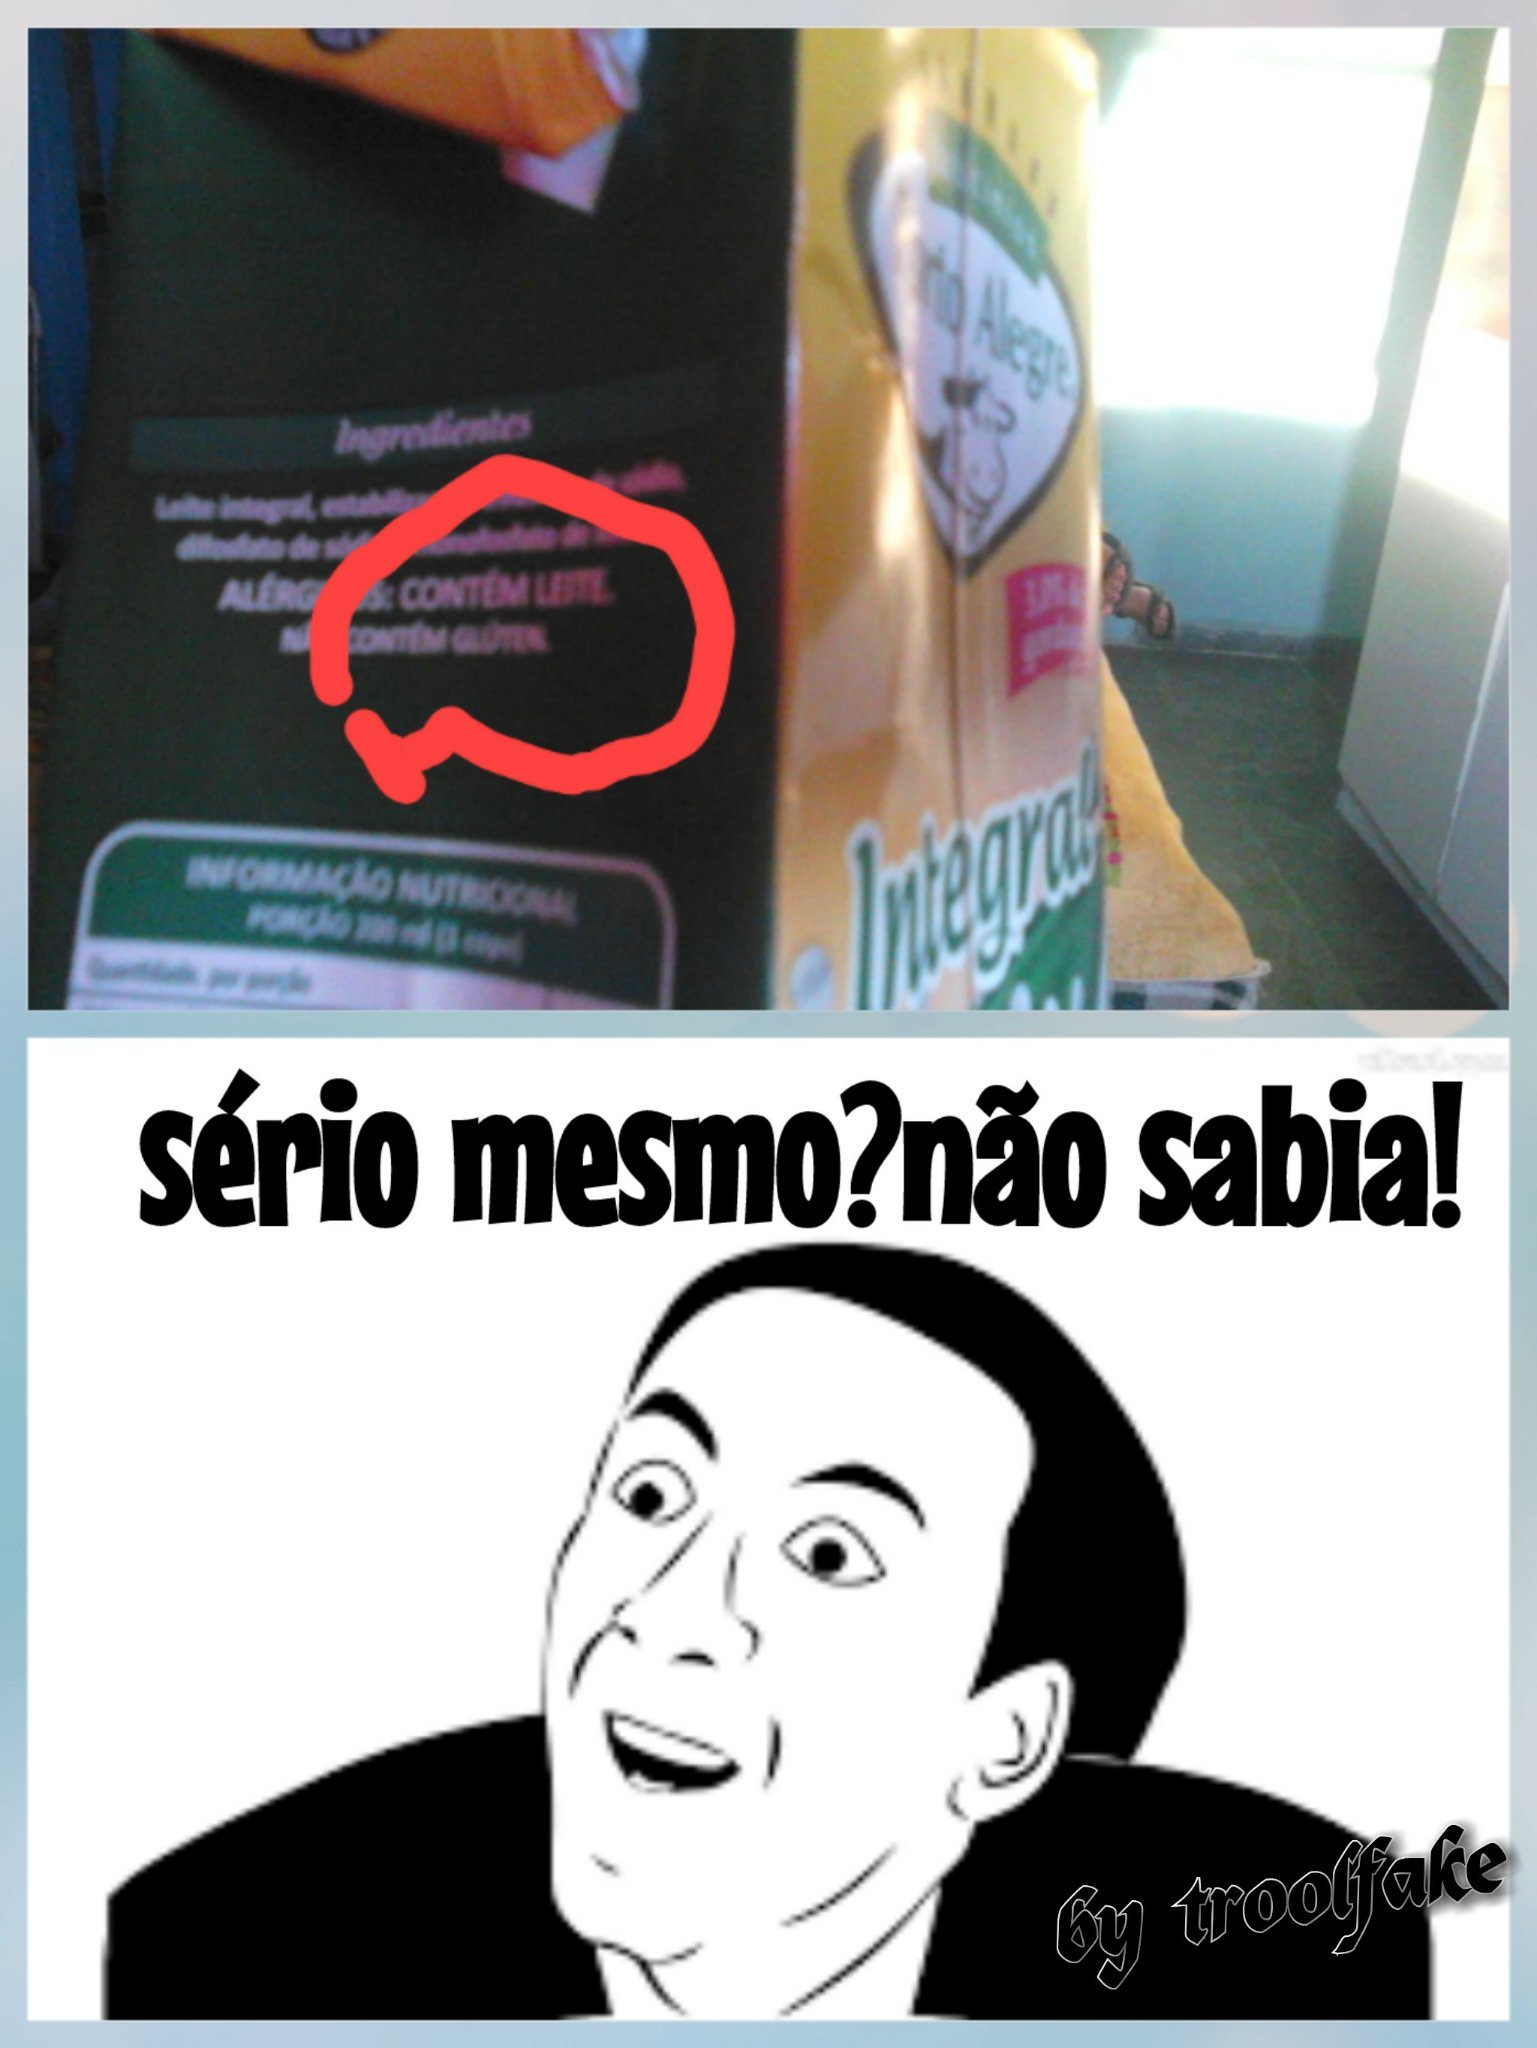 Titulo foi ver se tem leite mesmo(quem n consegue ler esta escrito: contem leite). - meme